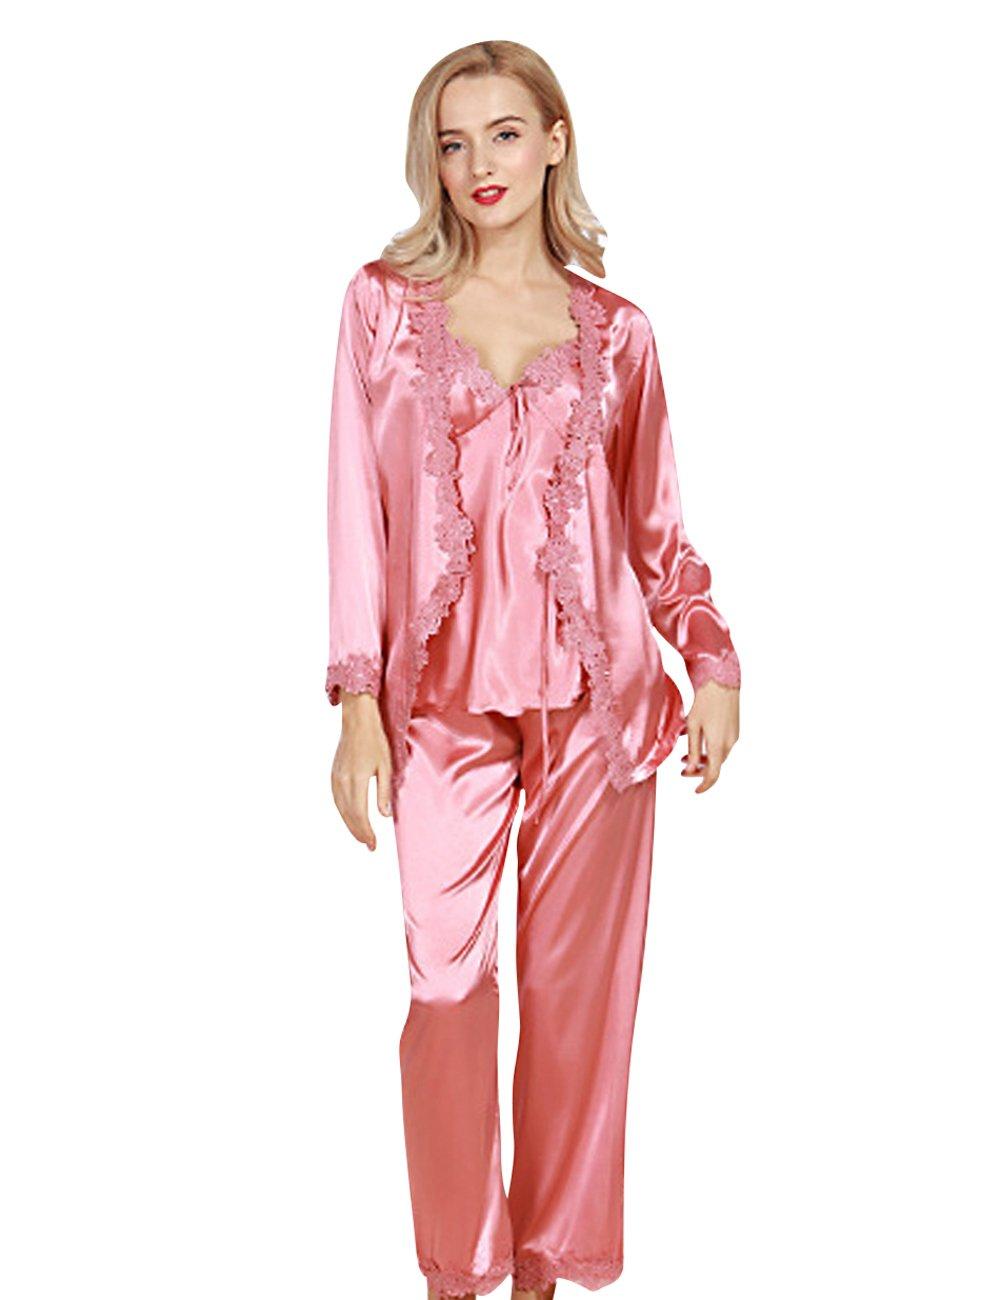 Menschwear 7807 Mujer Rayón Pantalones Pijamas Serie de la Serie ...